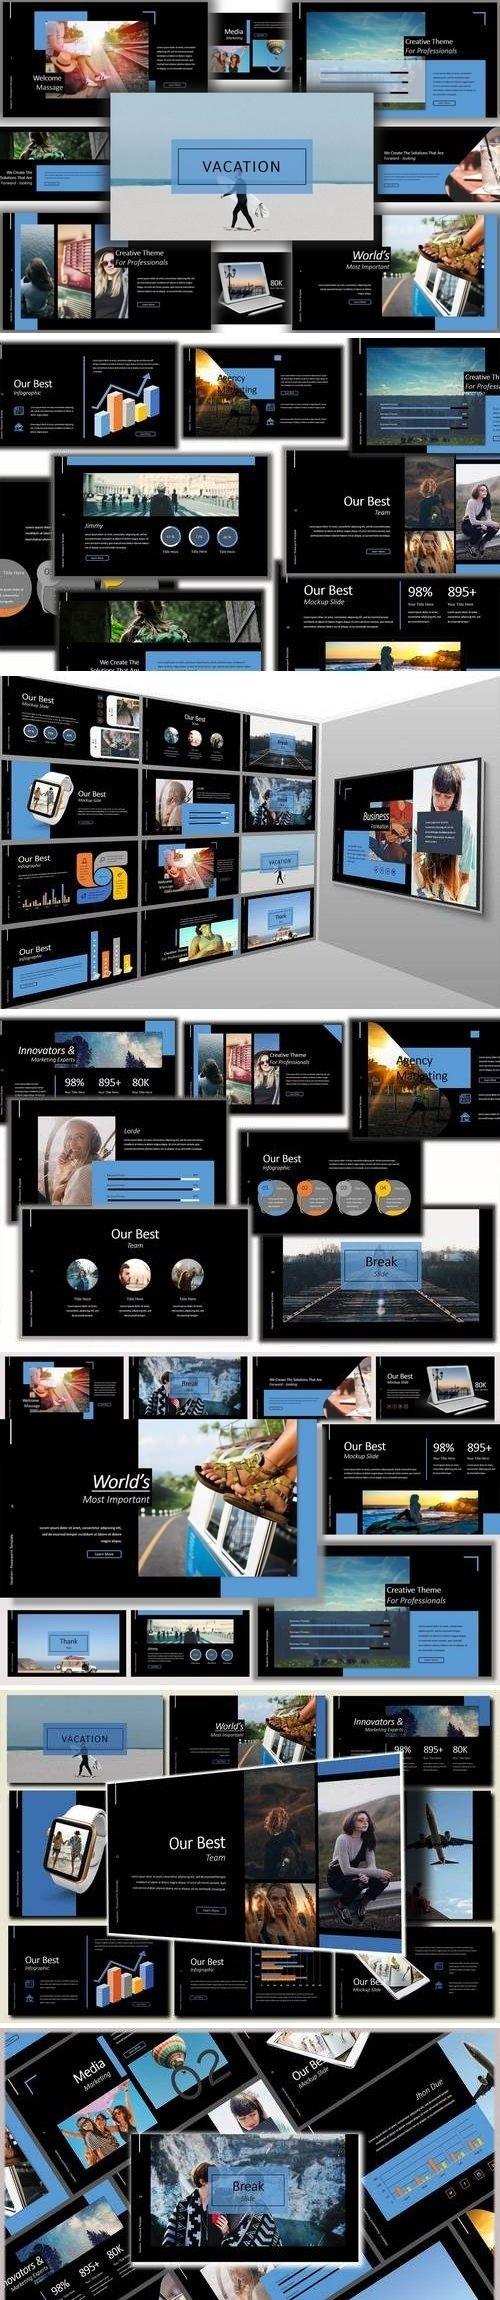 Vacation Lookbook Dark - Powerpoint, Keynote, Google Sliders Templates